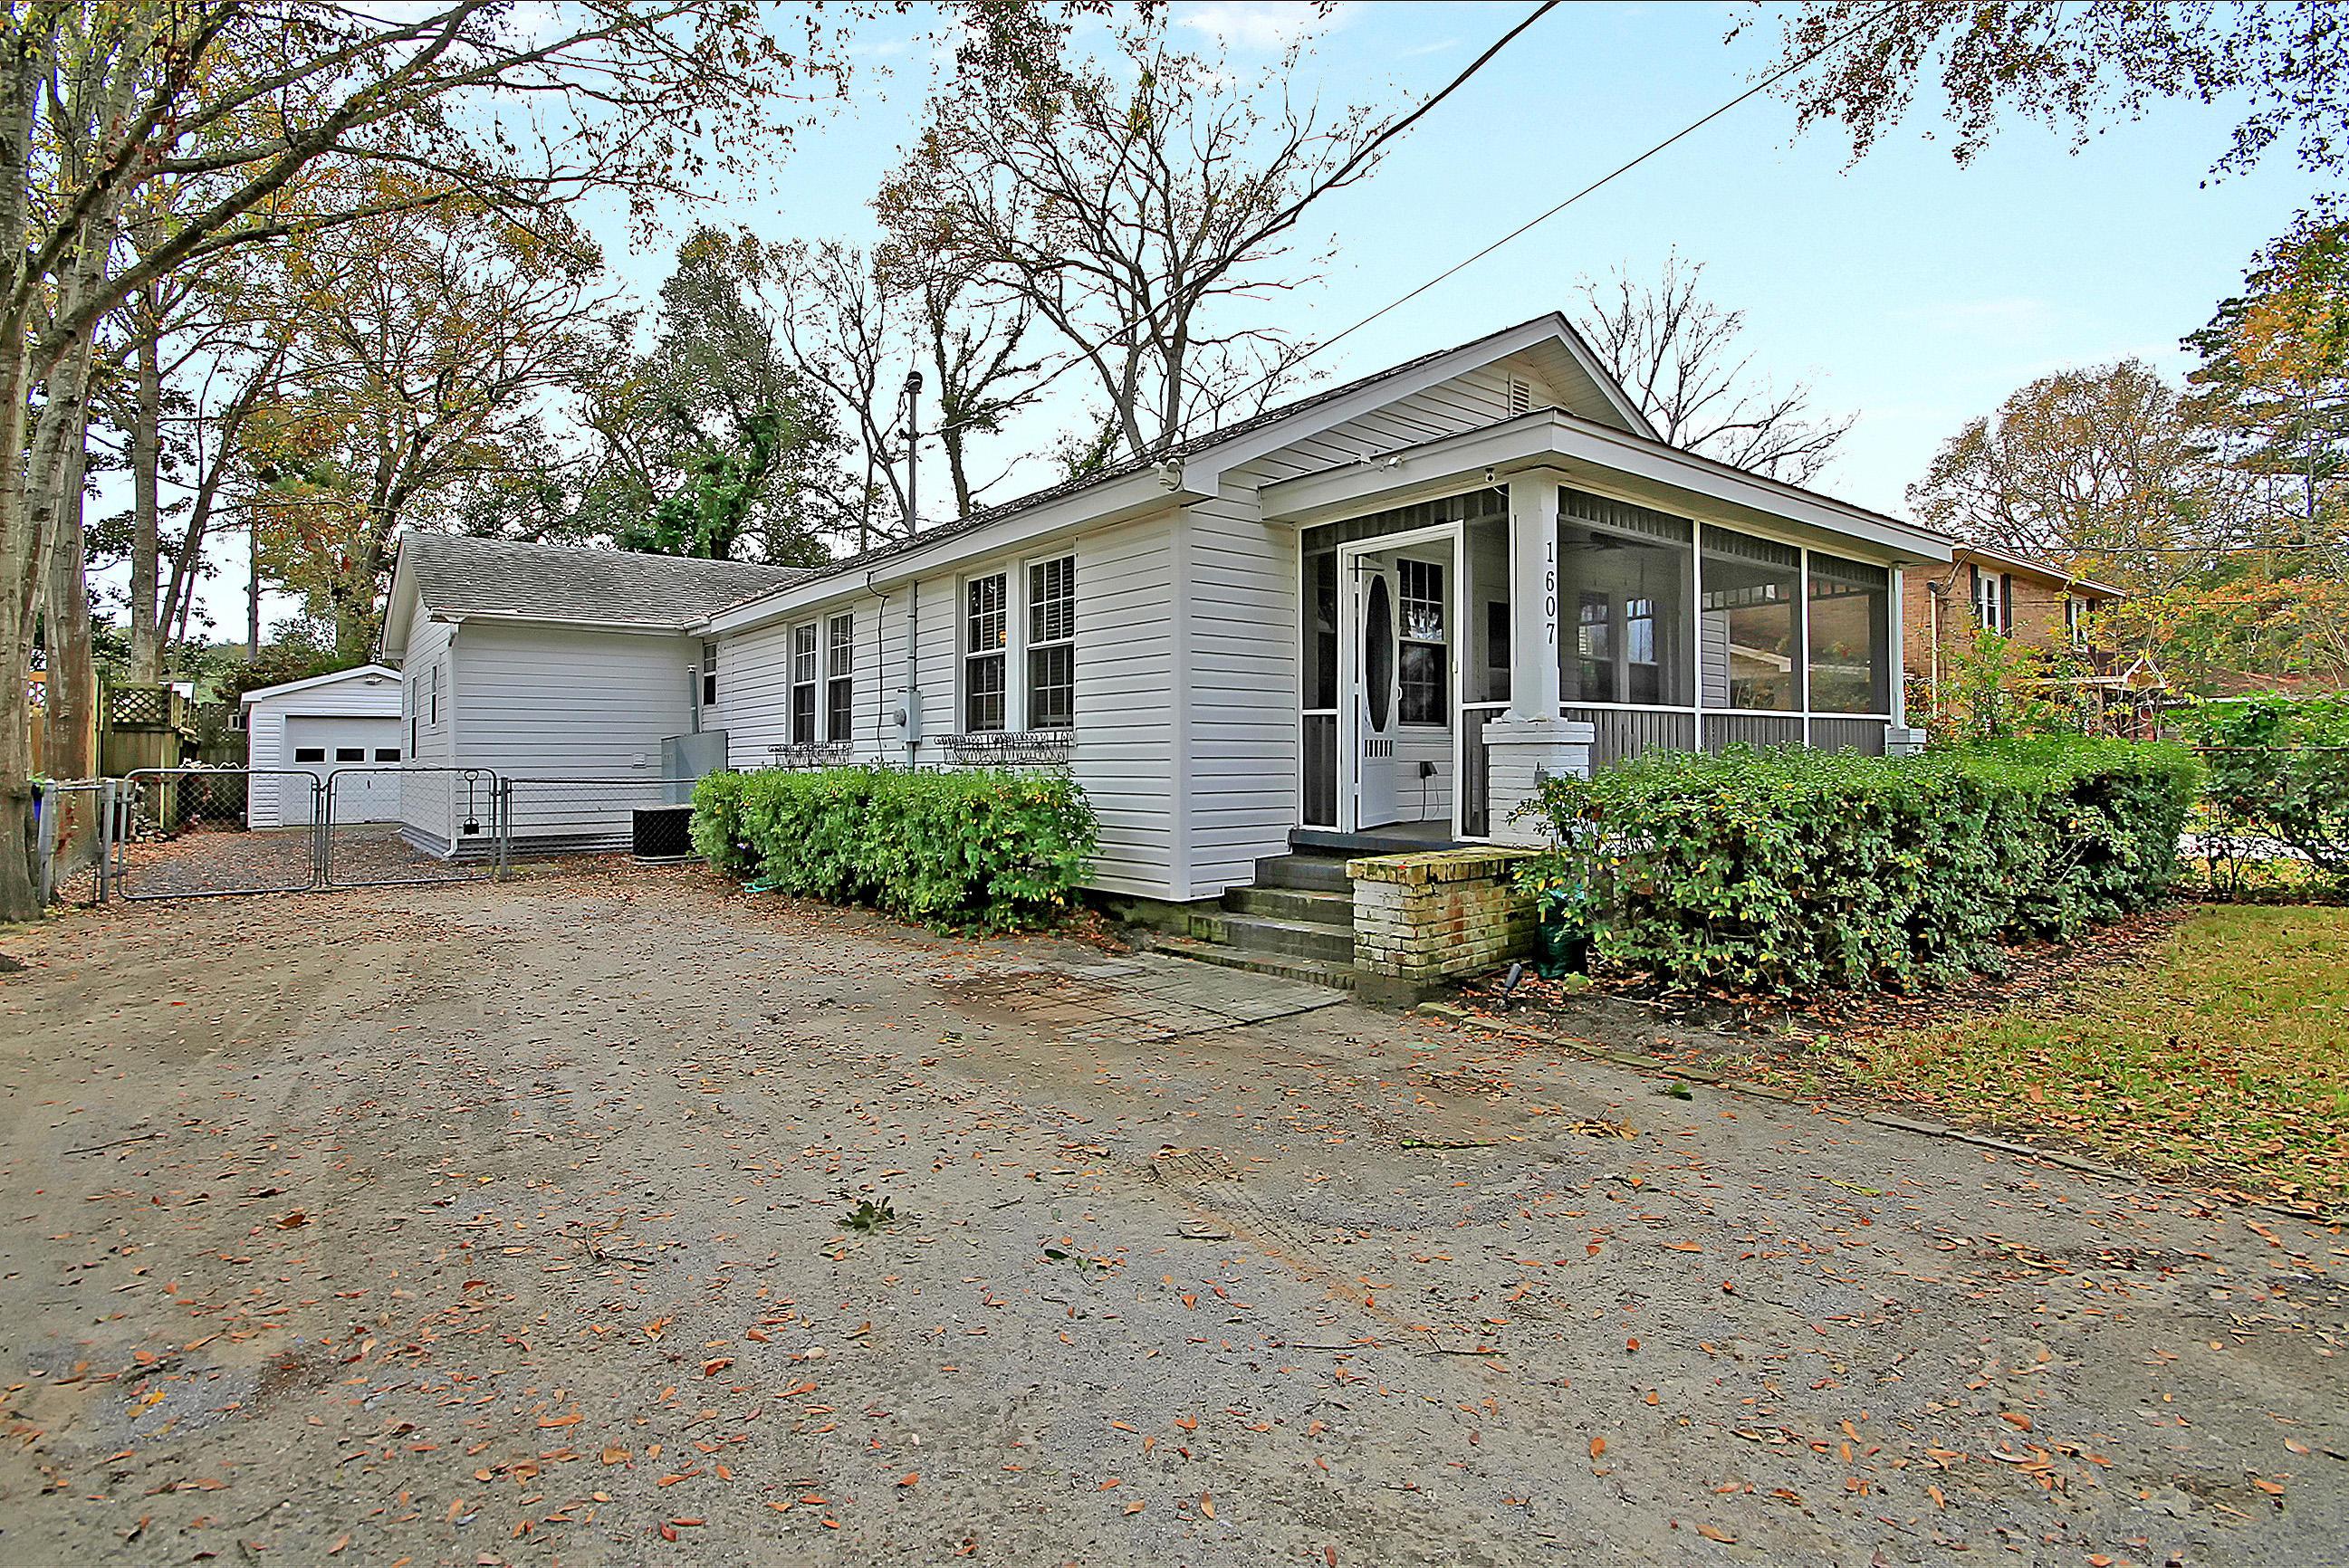 Pinecrest Gardens Homes For Sale - 1607 Pinecrest, Charleston, SC - 13